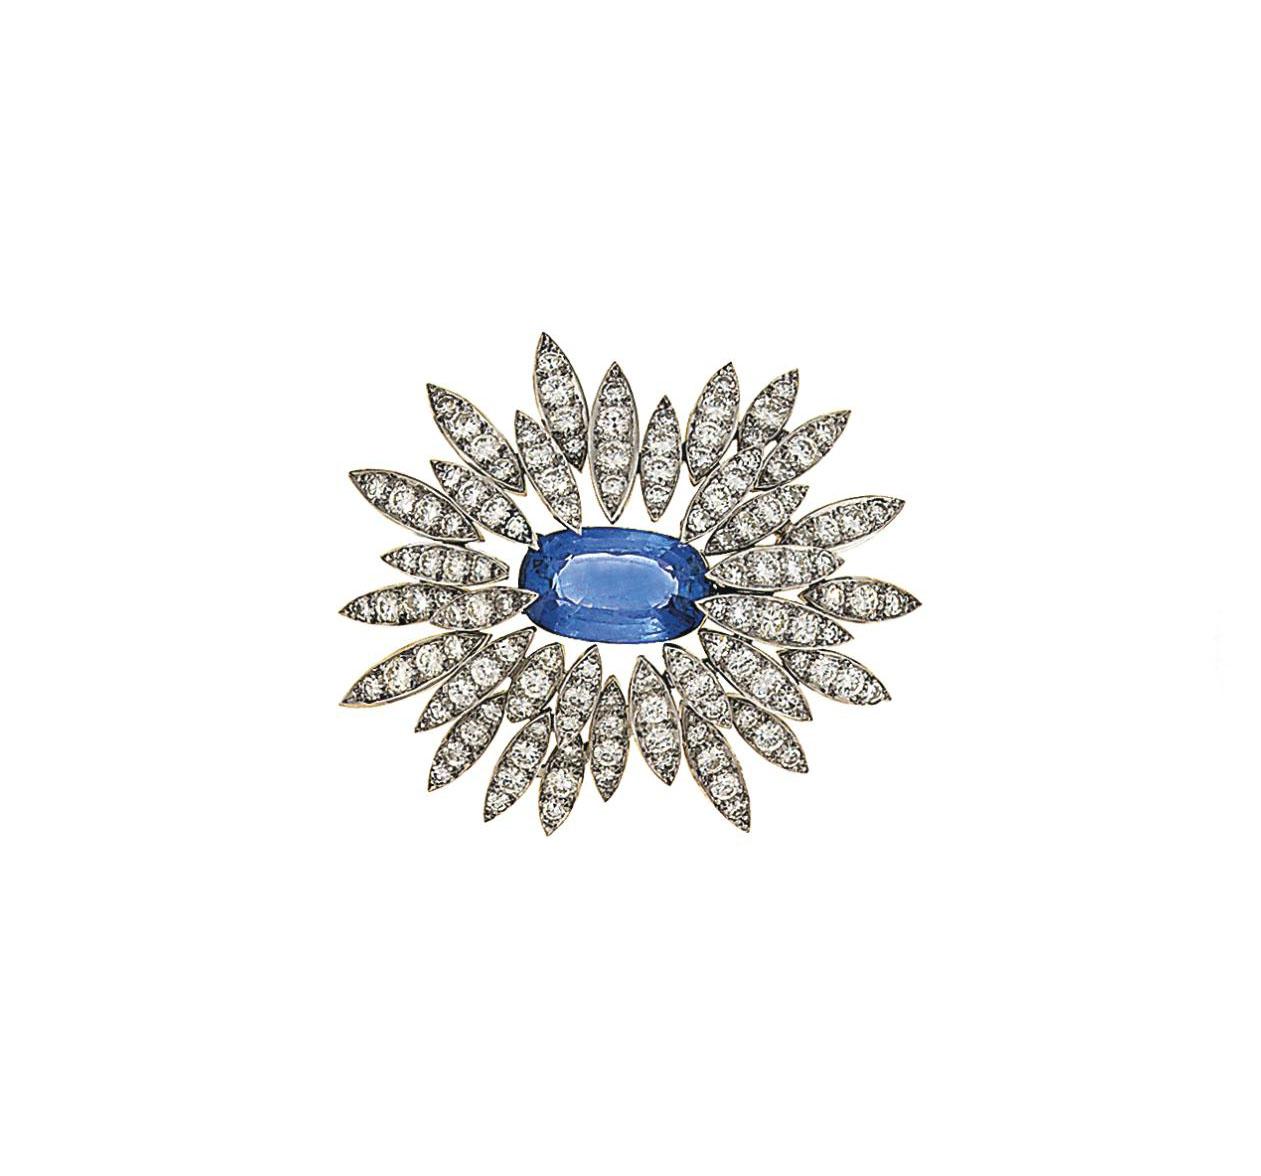 A sapphire and diamond brooch,